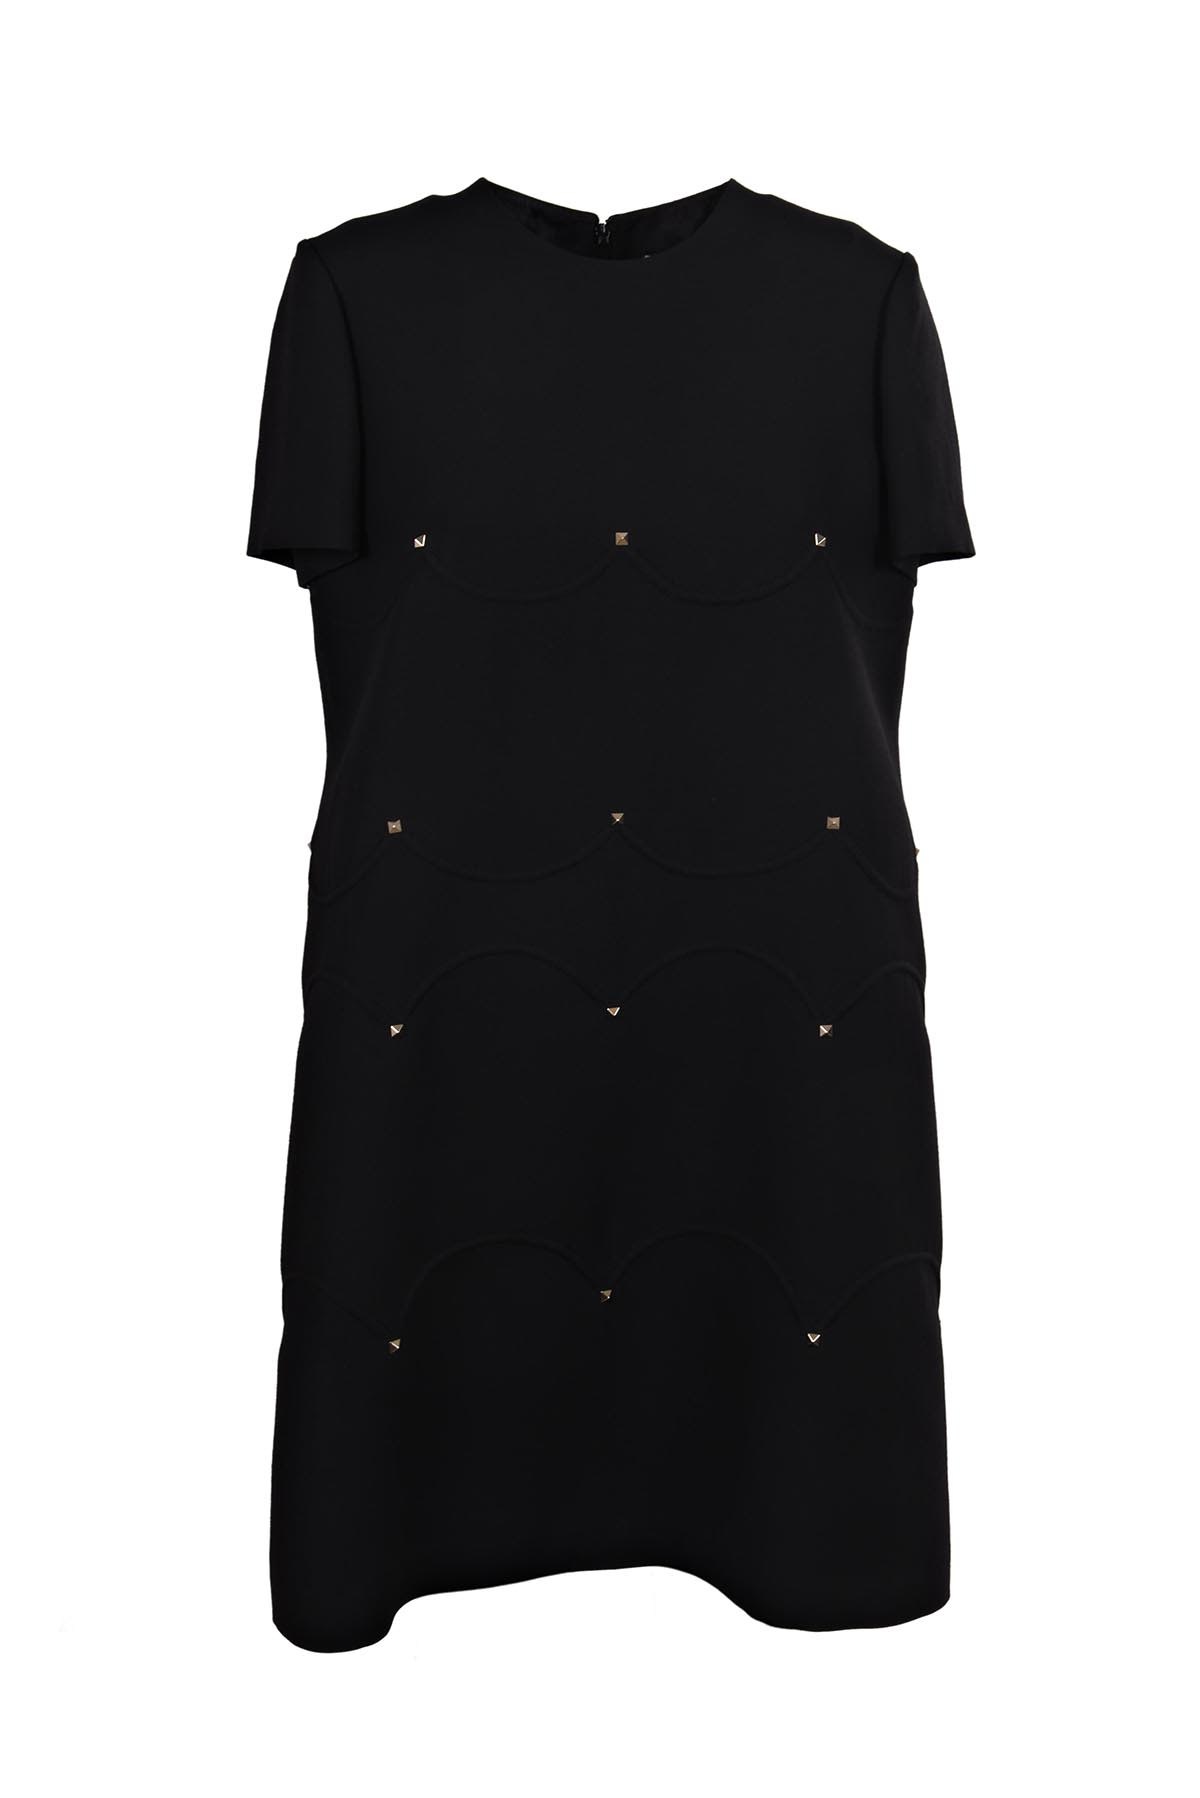 Valentino Studded Mini Dress